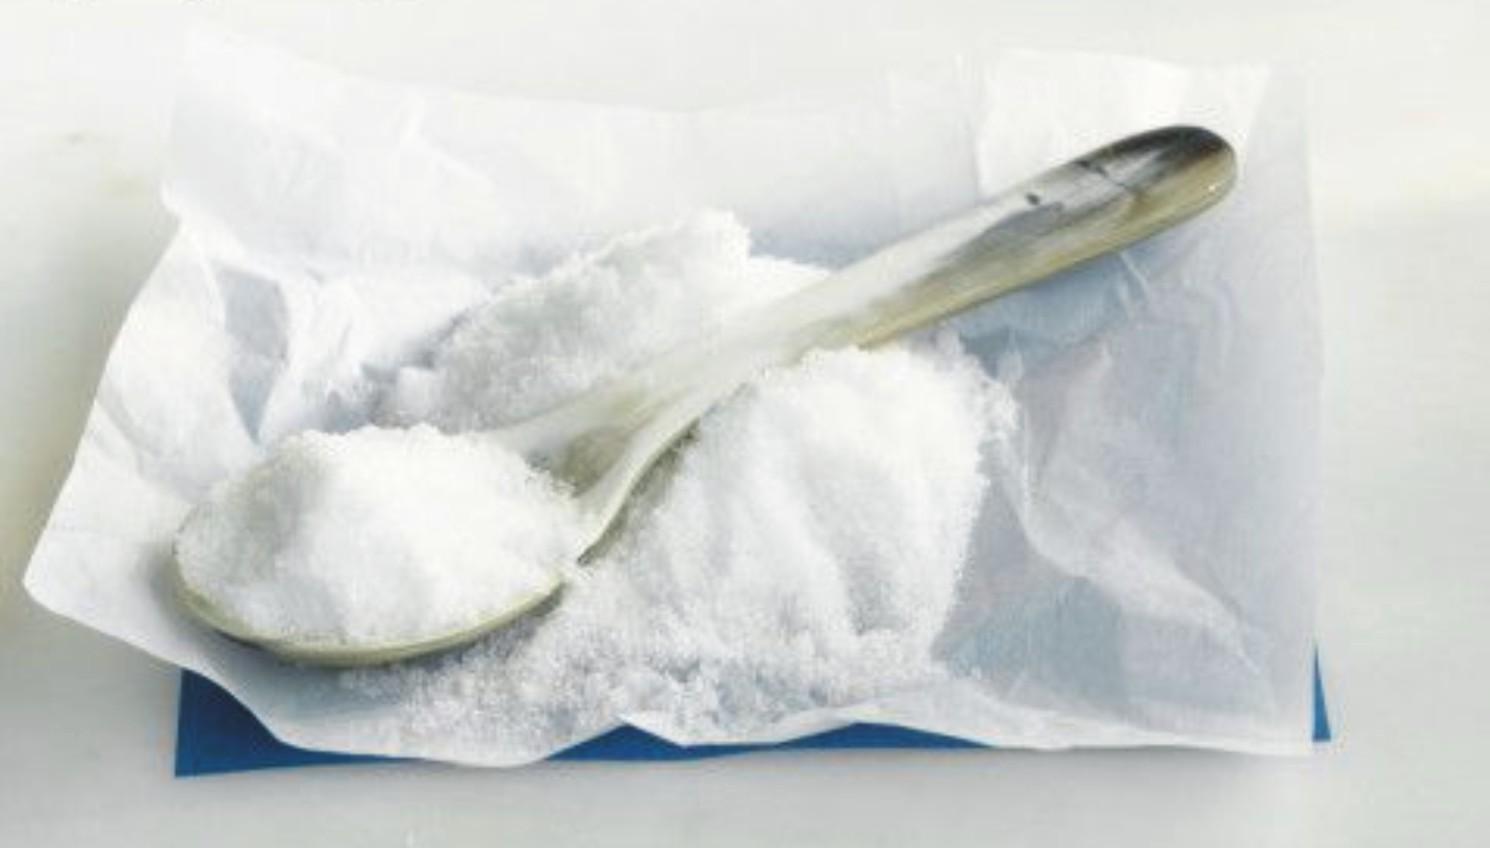 Manfaat Penting Kandungan Mineral dalam Garam Bagi Tubuh